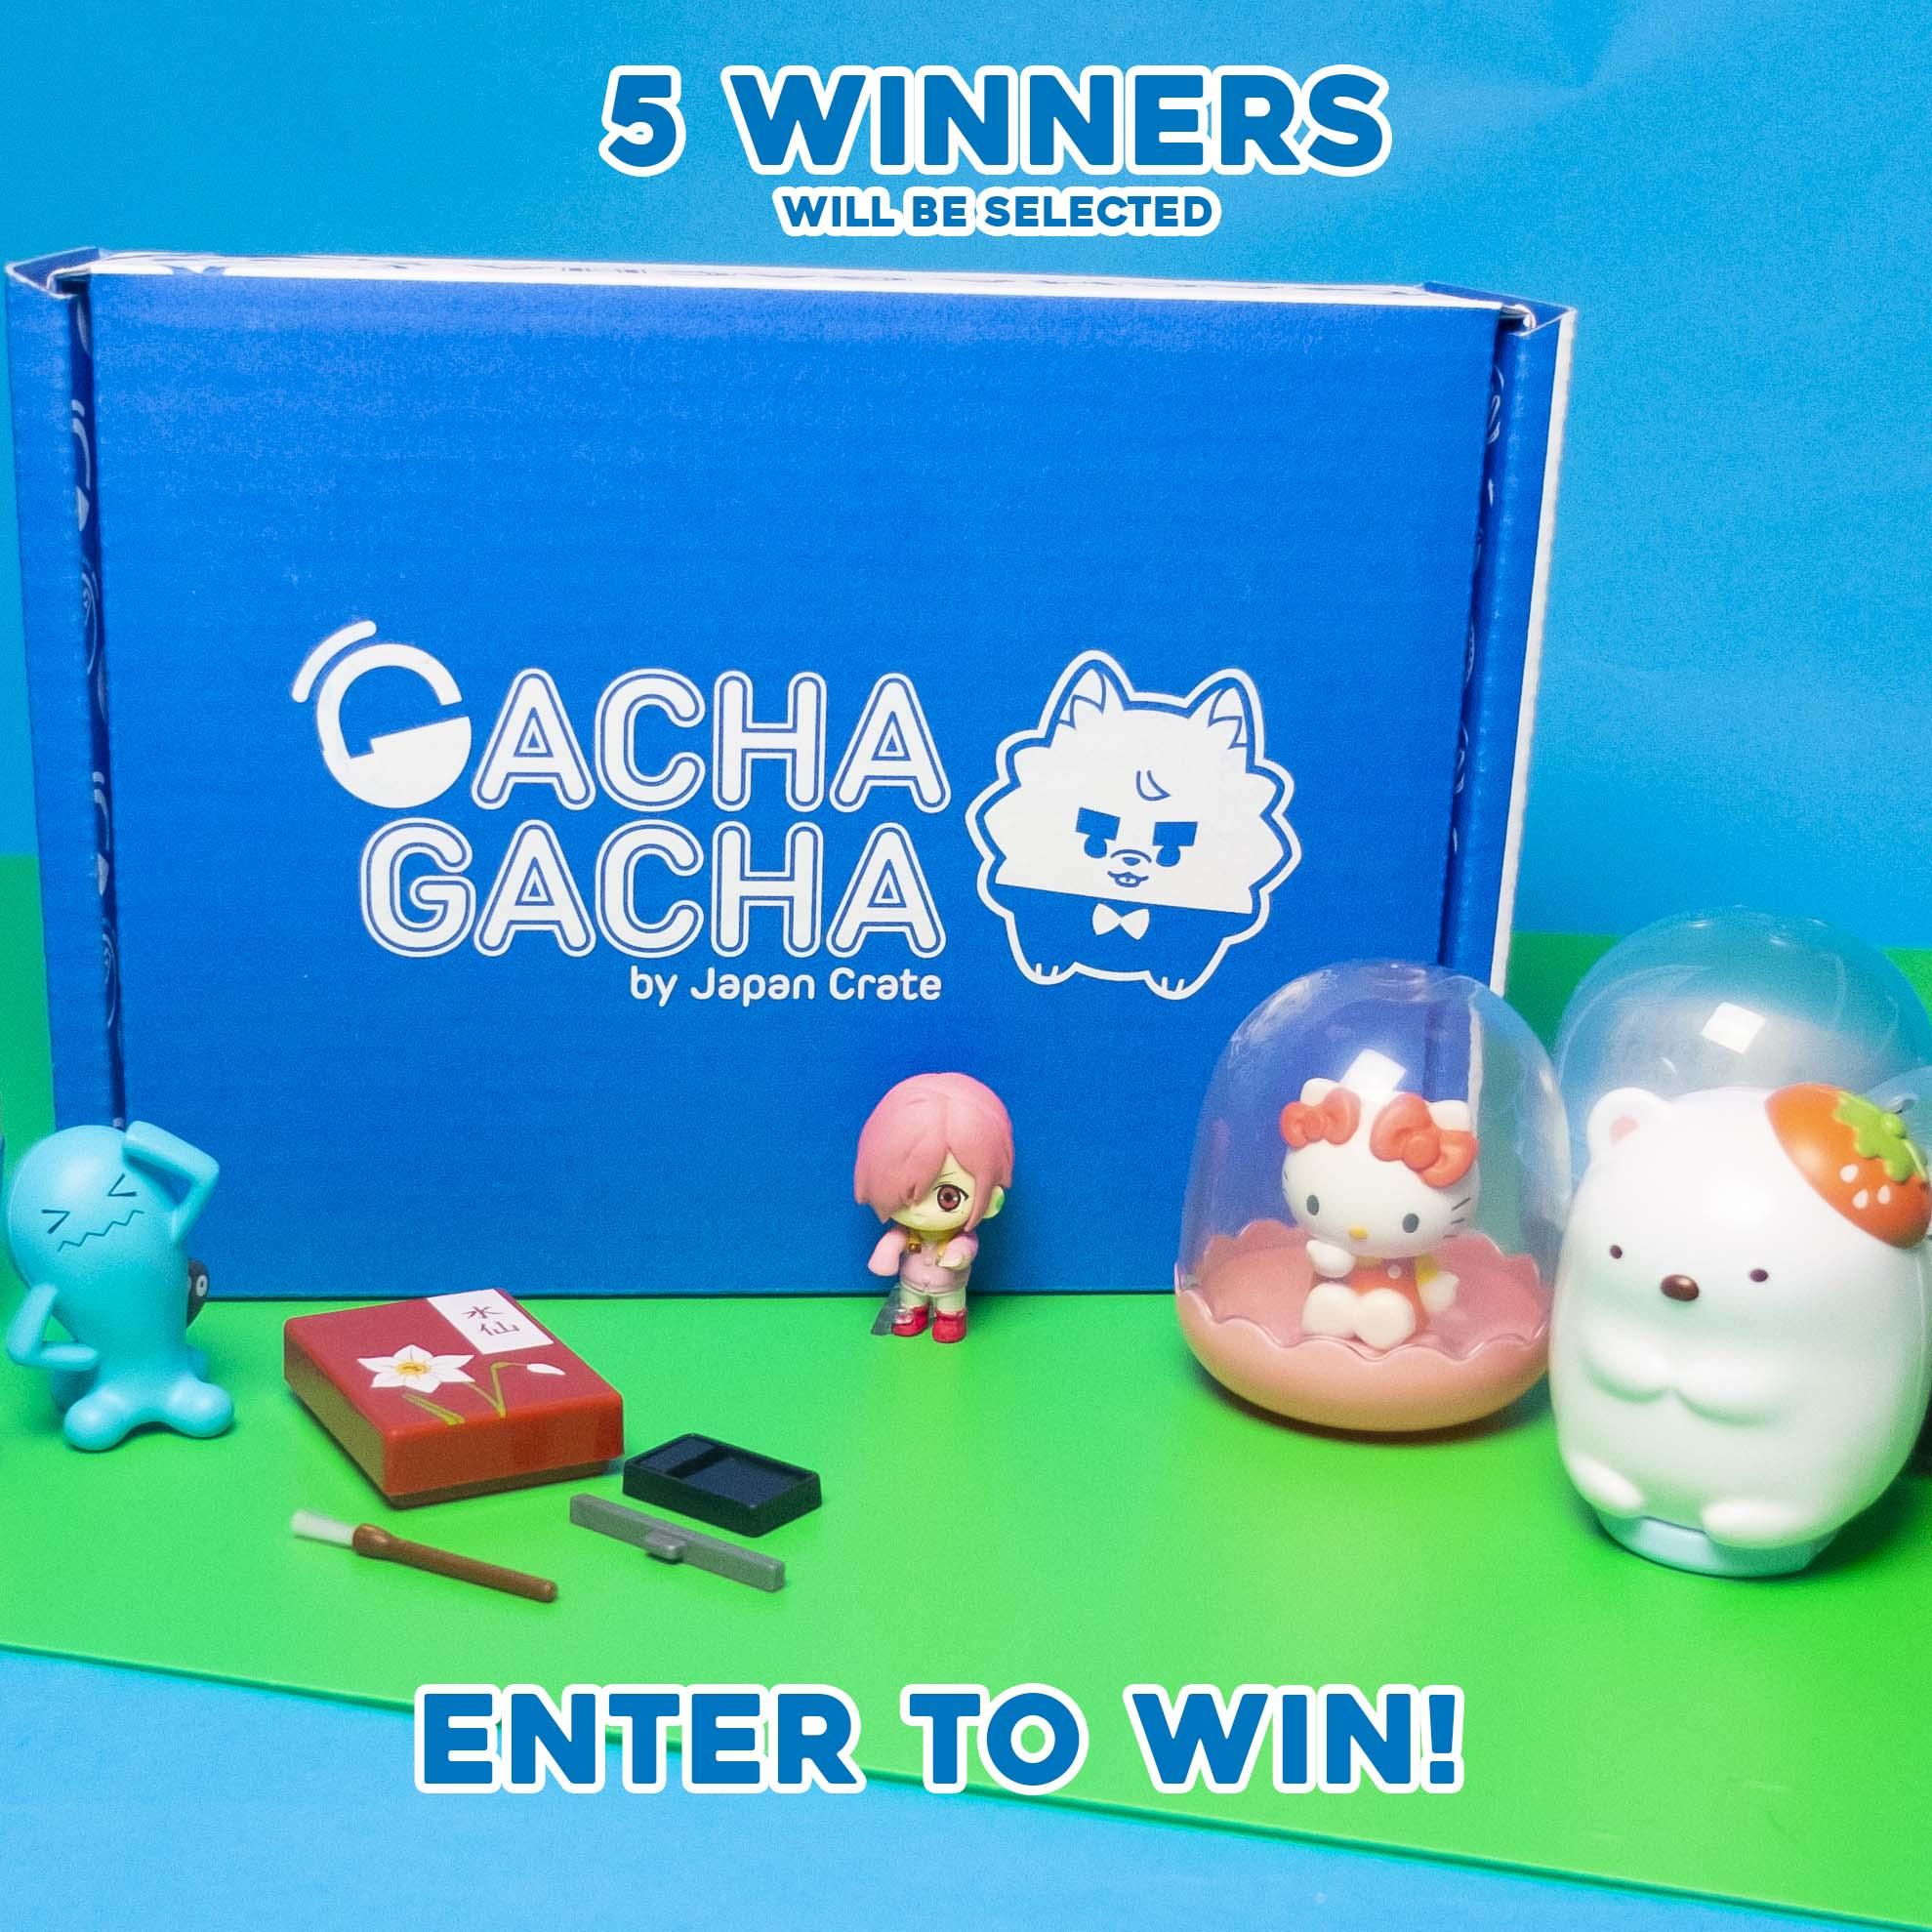 Gacha Gacha Crate x March 2021 Crate Giveaway Giveaway Image